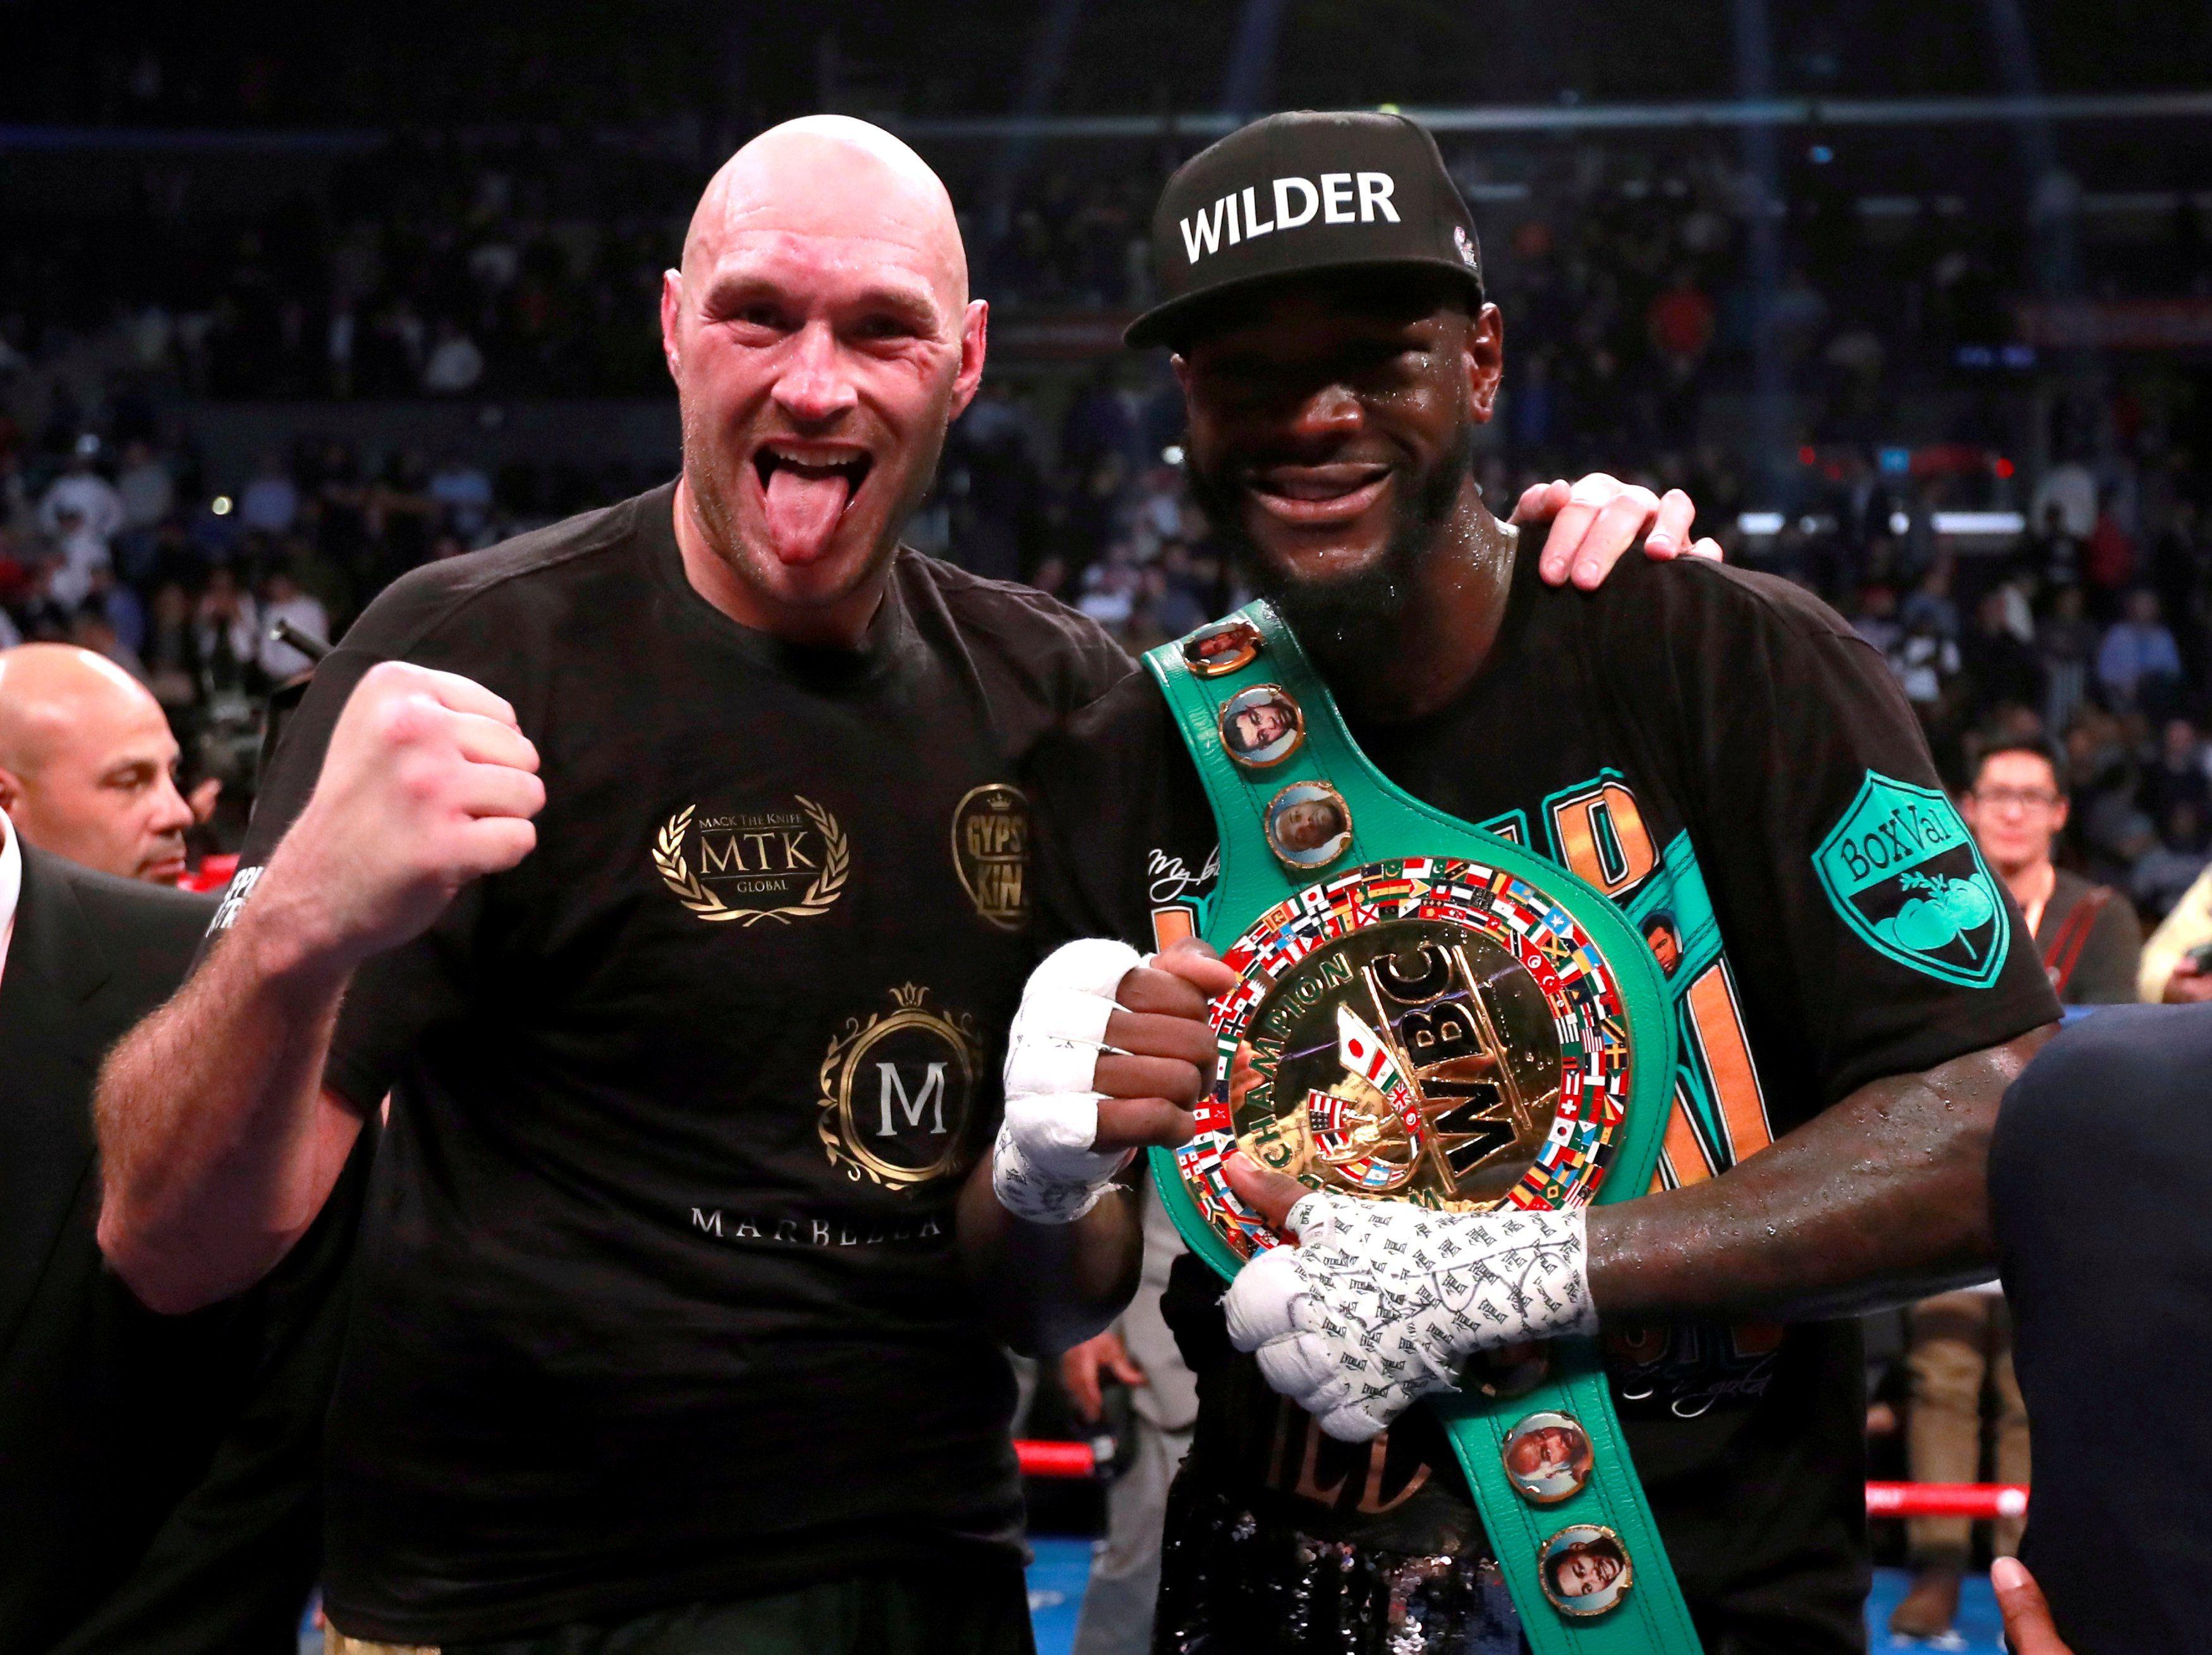 La pelea en el Staples Center de Los Angeles terminó en empate (Reuters/Andrew Couldridge/File Photo)